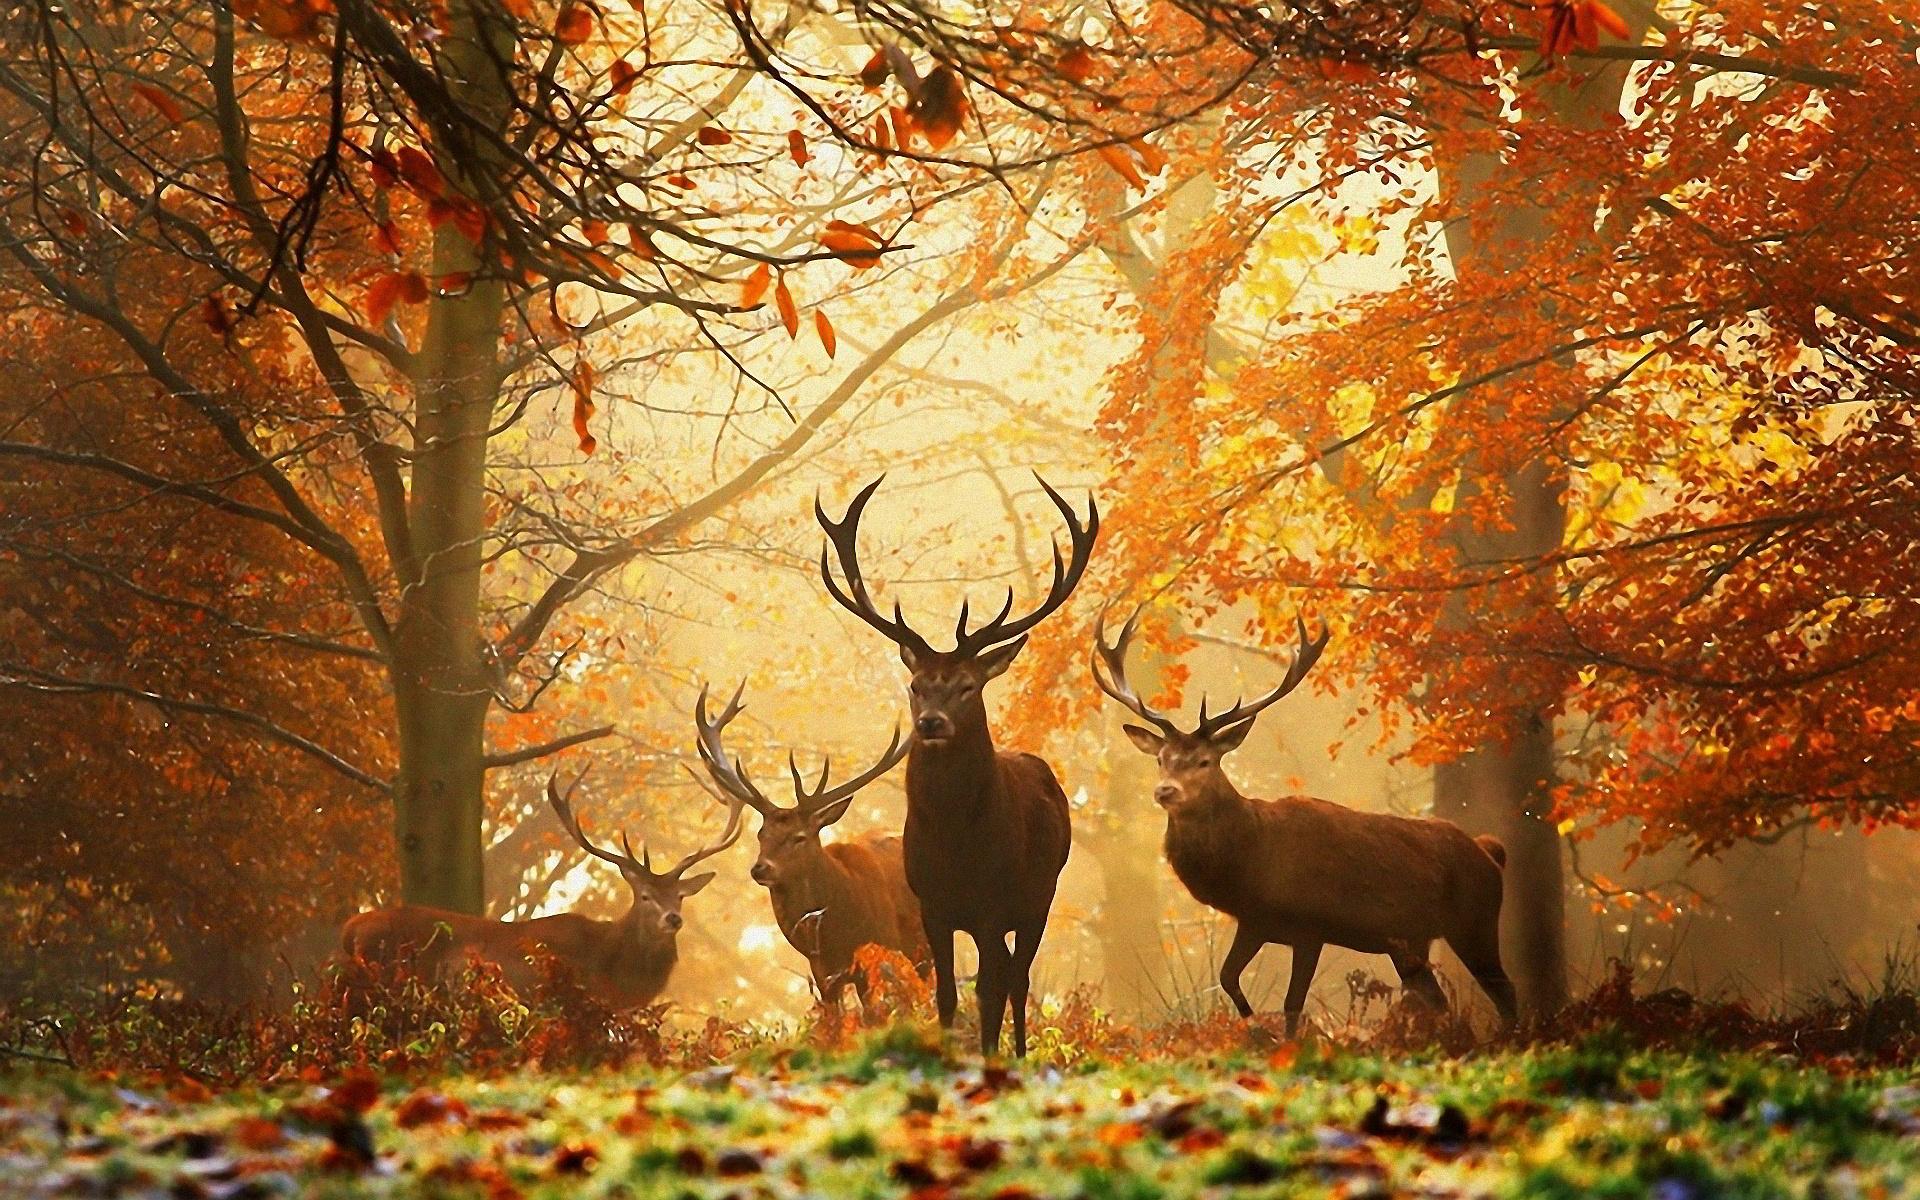 Autumn Wallpaper Hd Desktop Wallpapers 4k Hd